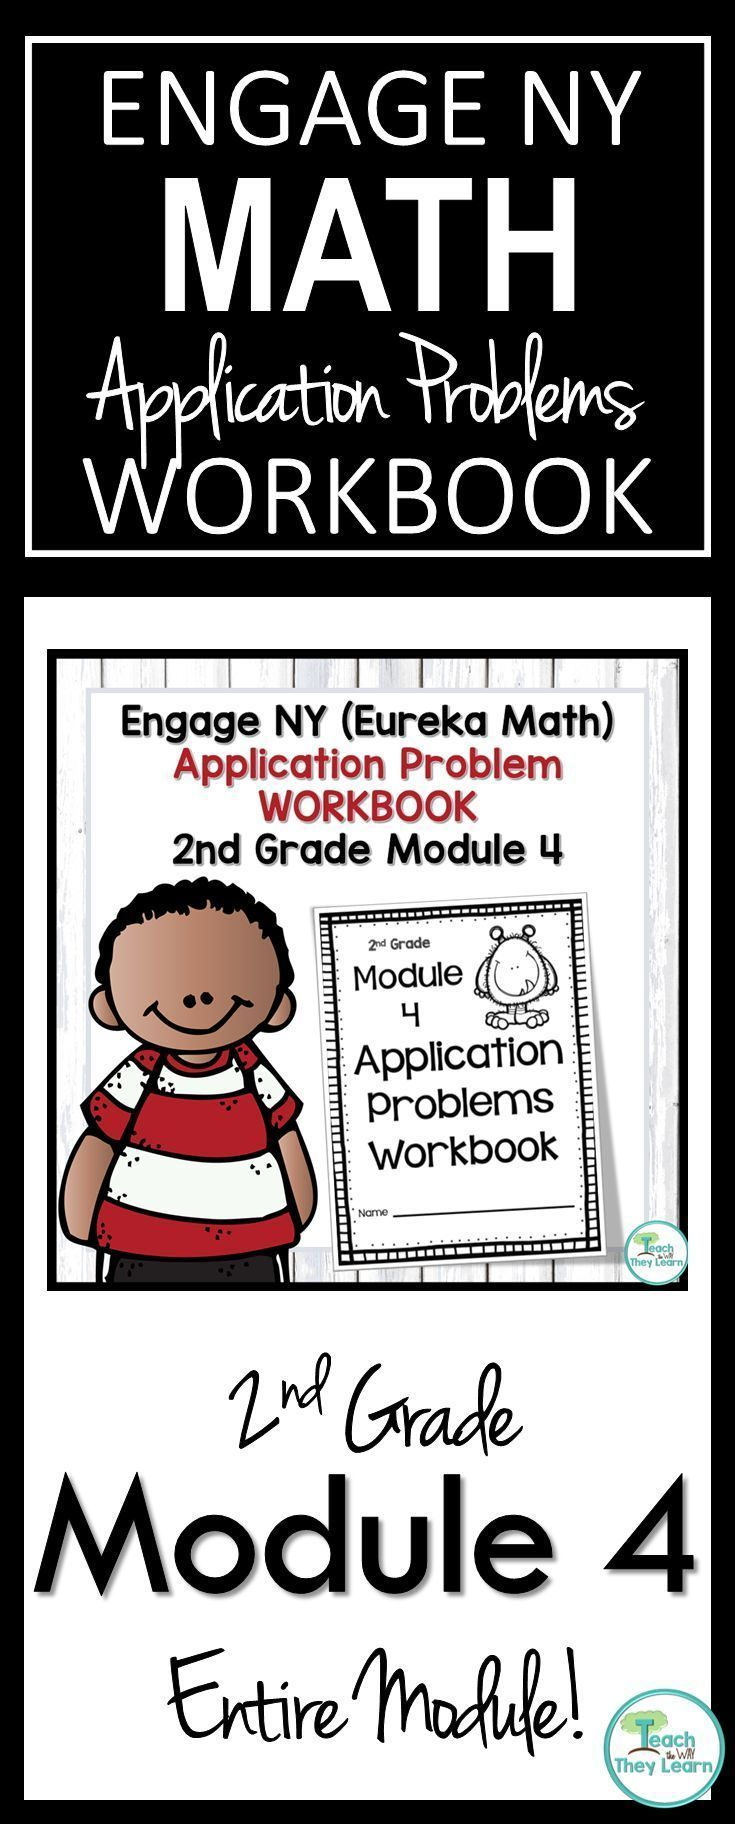 Engage NY/Eureka Math Application Problem Workbook 2nd Grade Module 4